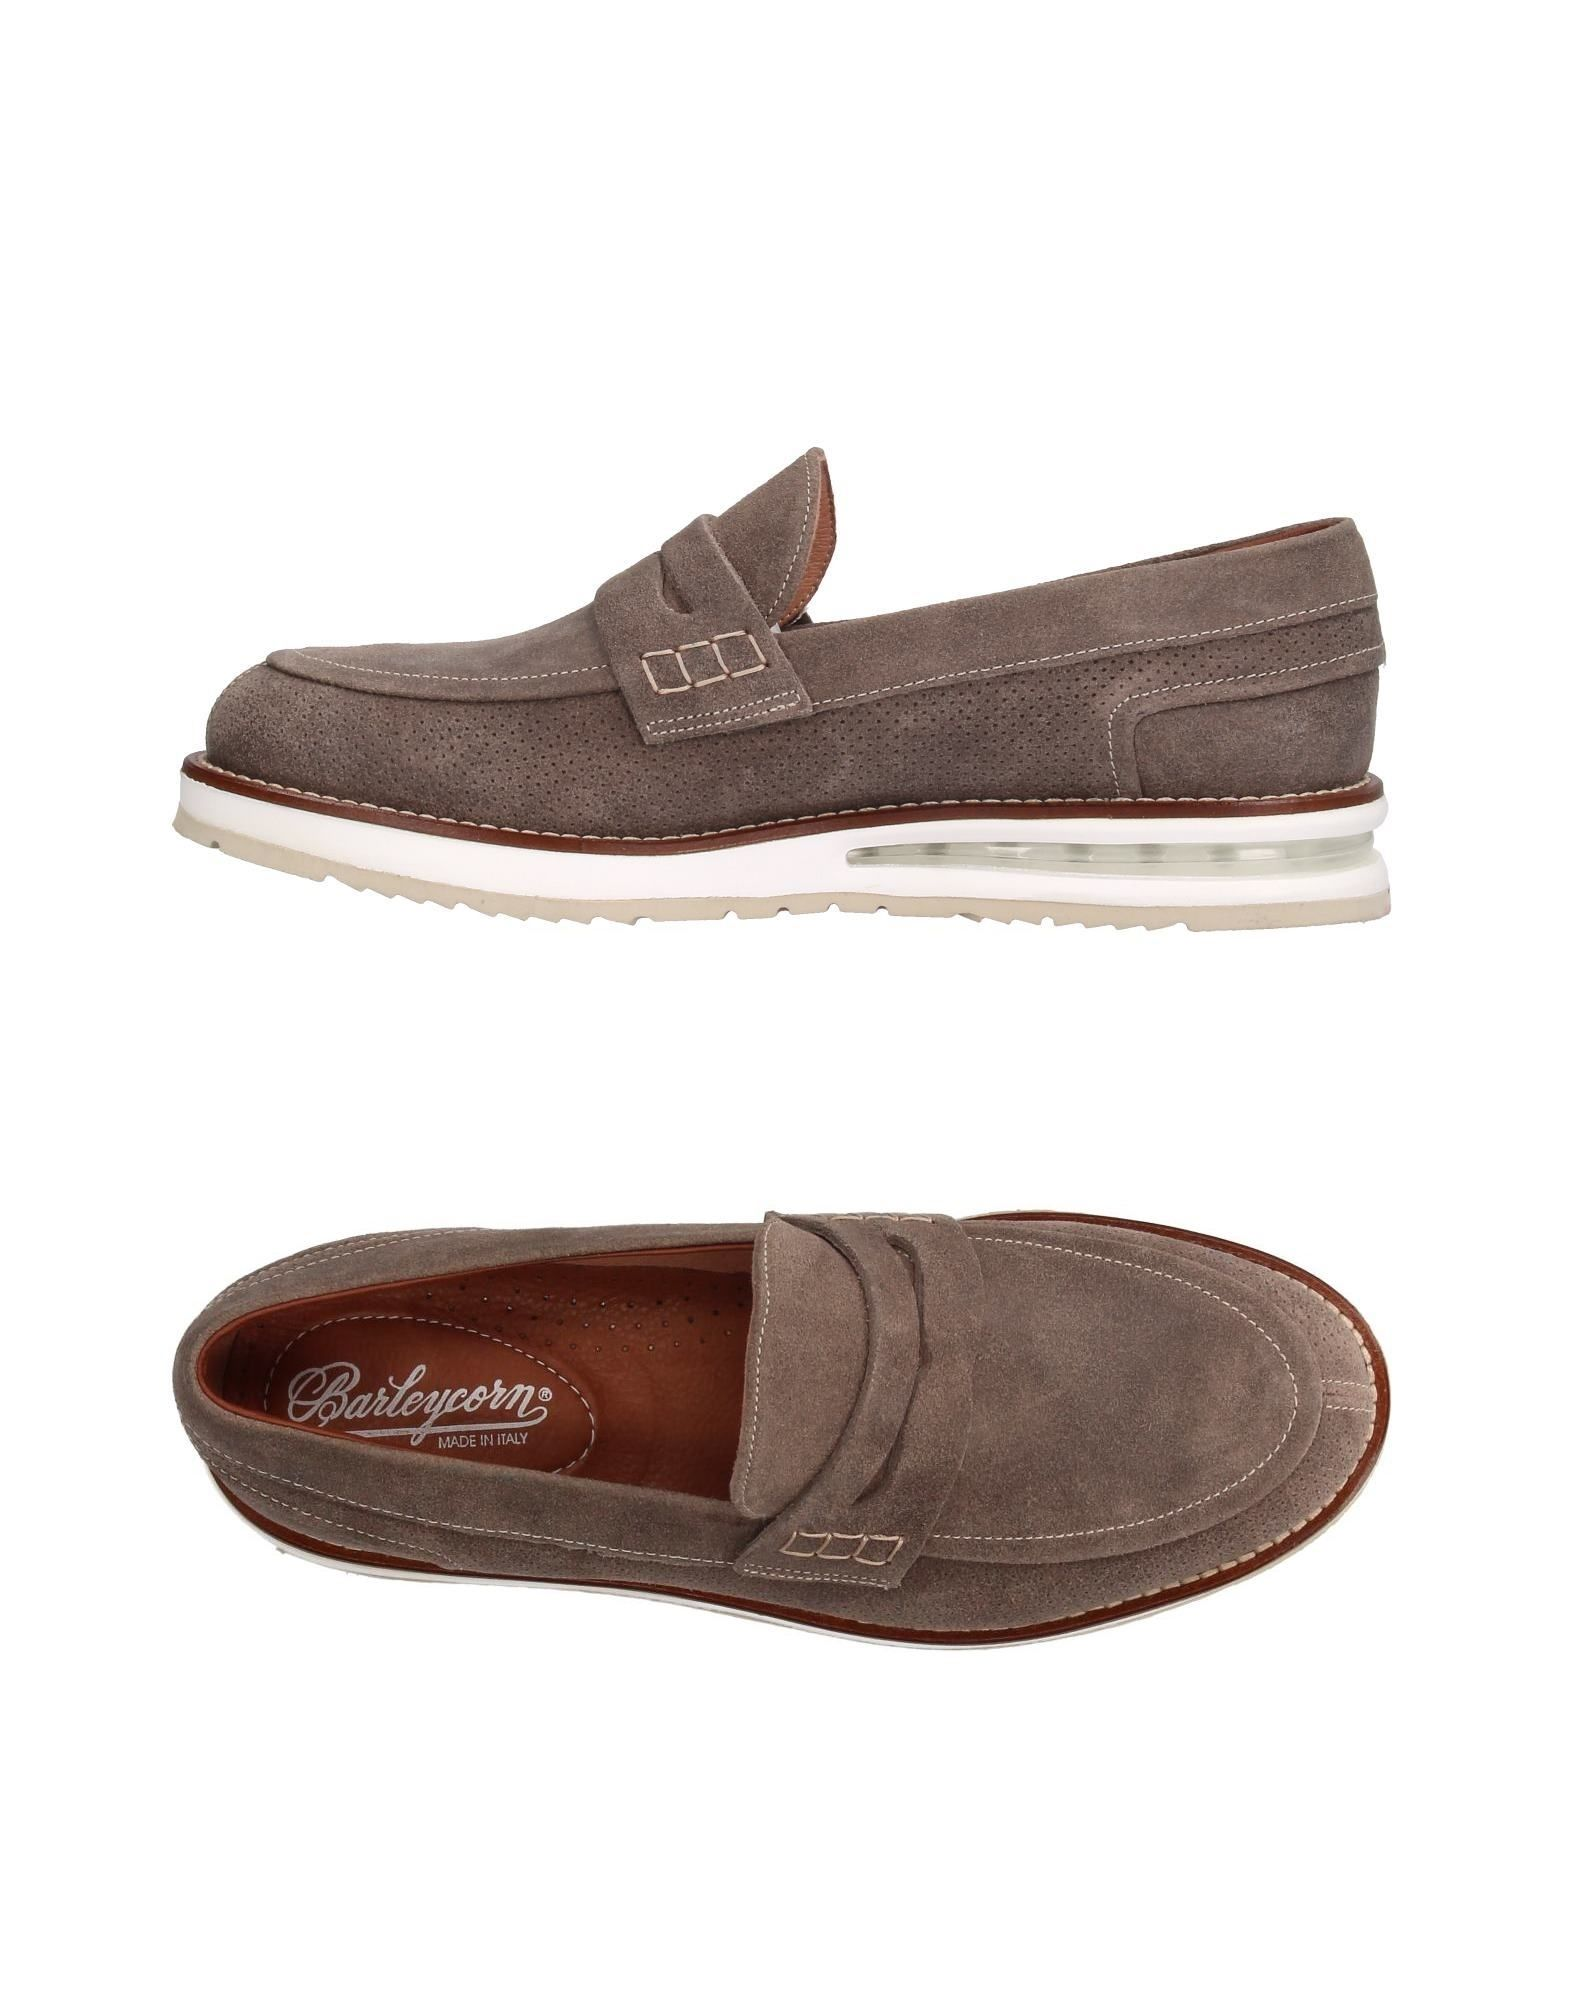 Rabatt Barleycorn echte Schuhe Barleycorn Rabatt Mokassins Herren  11198640MM 3baa86